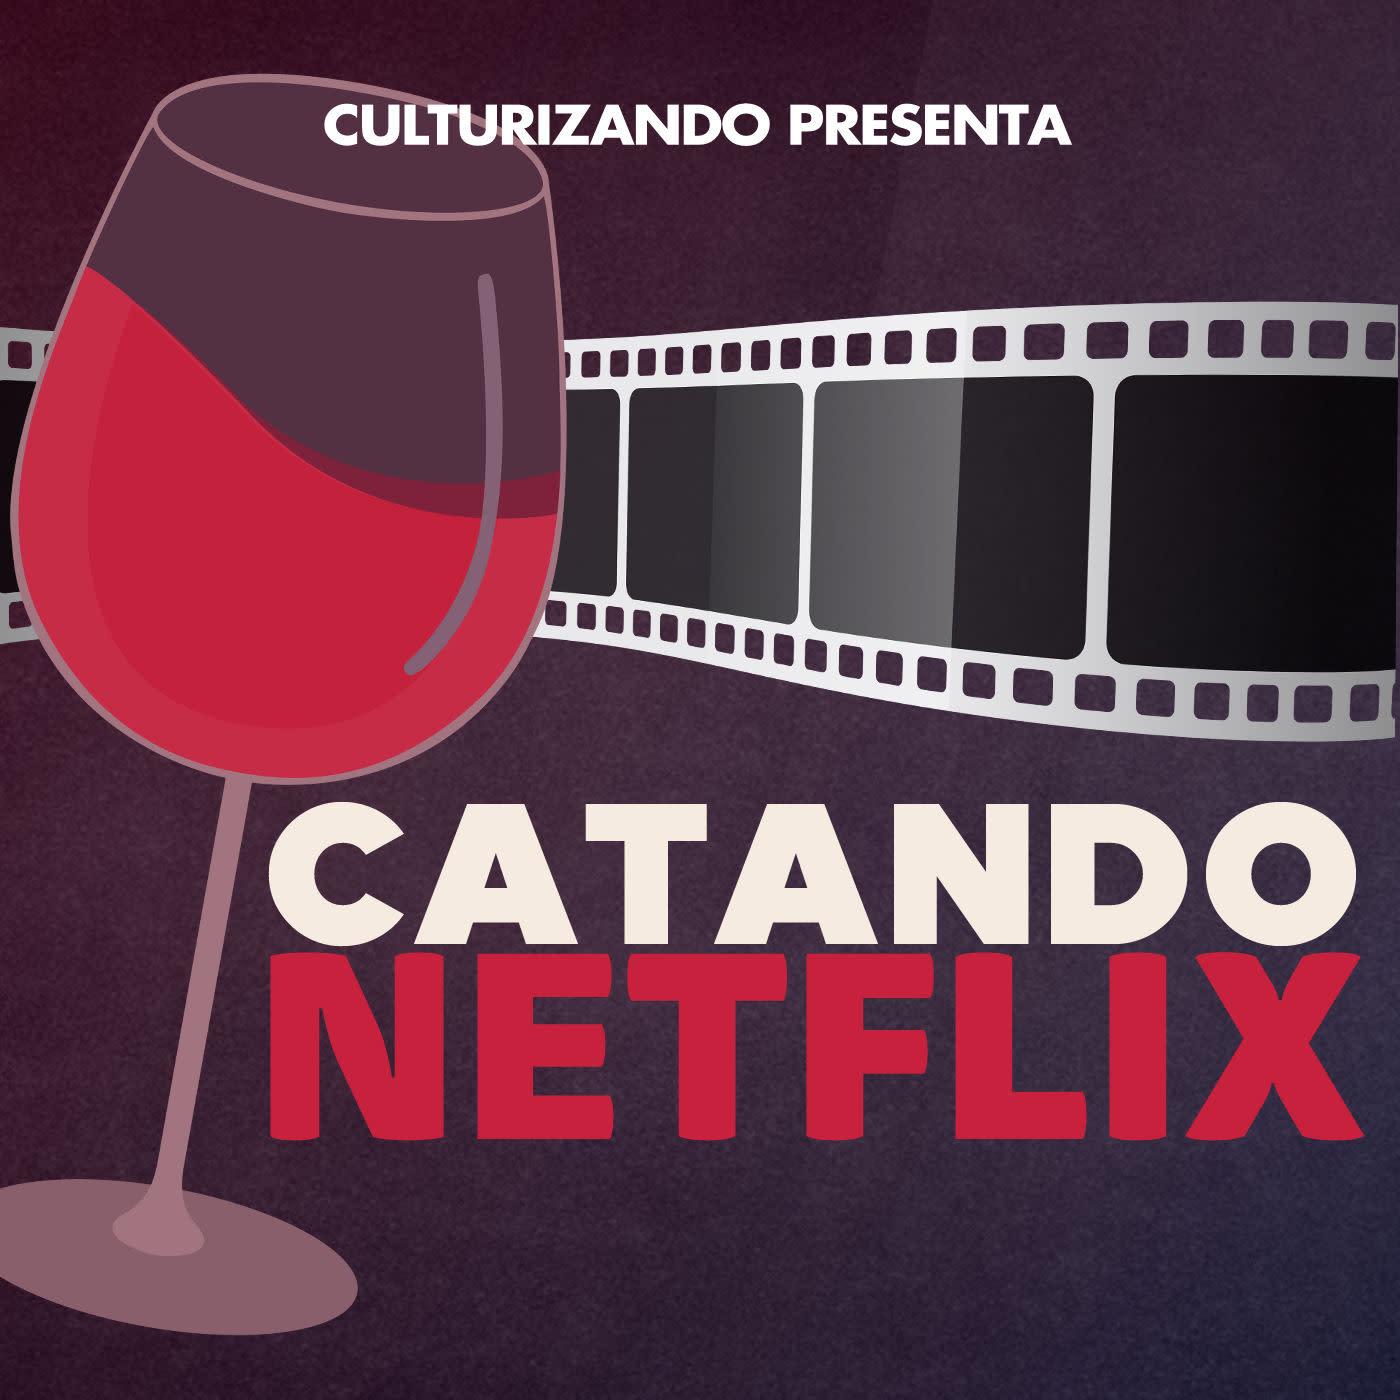 Catando Netflix